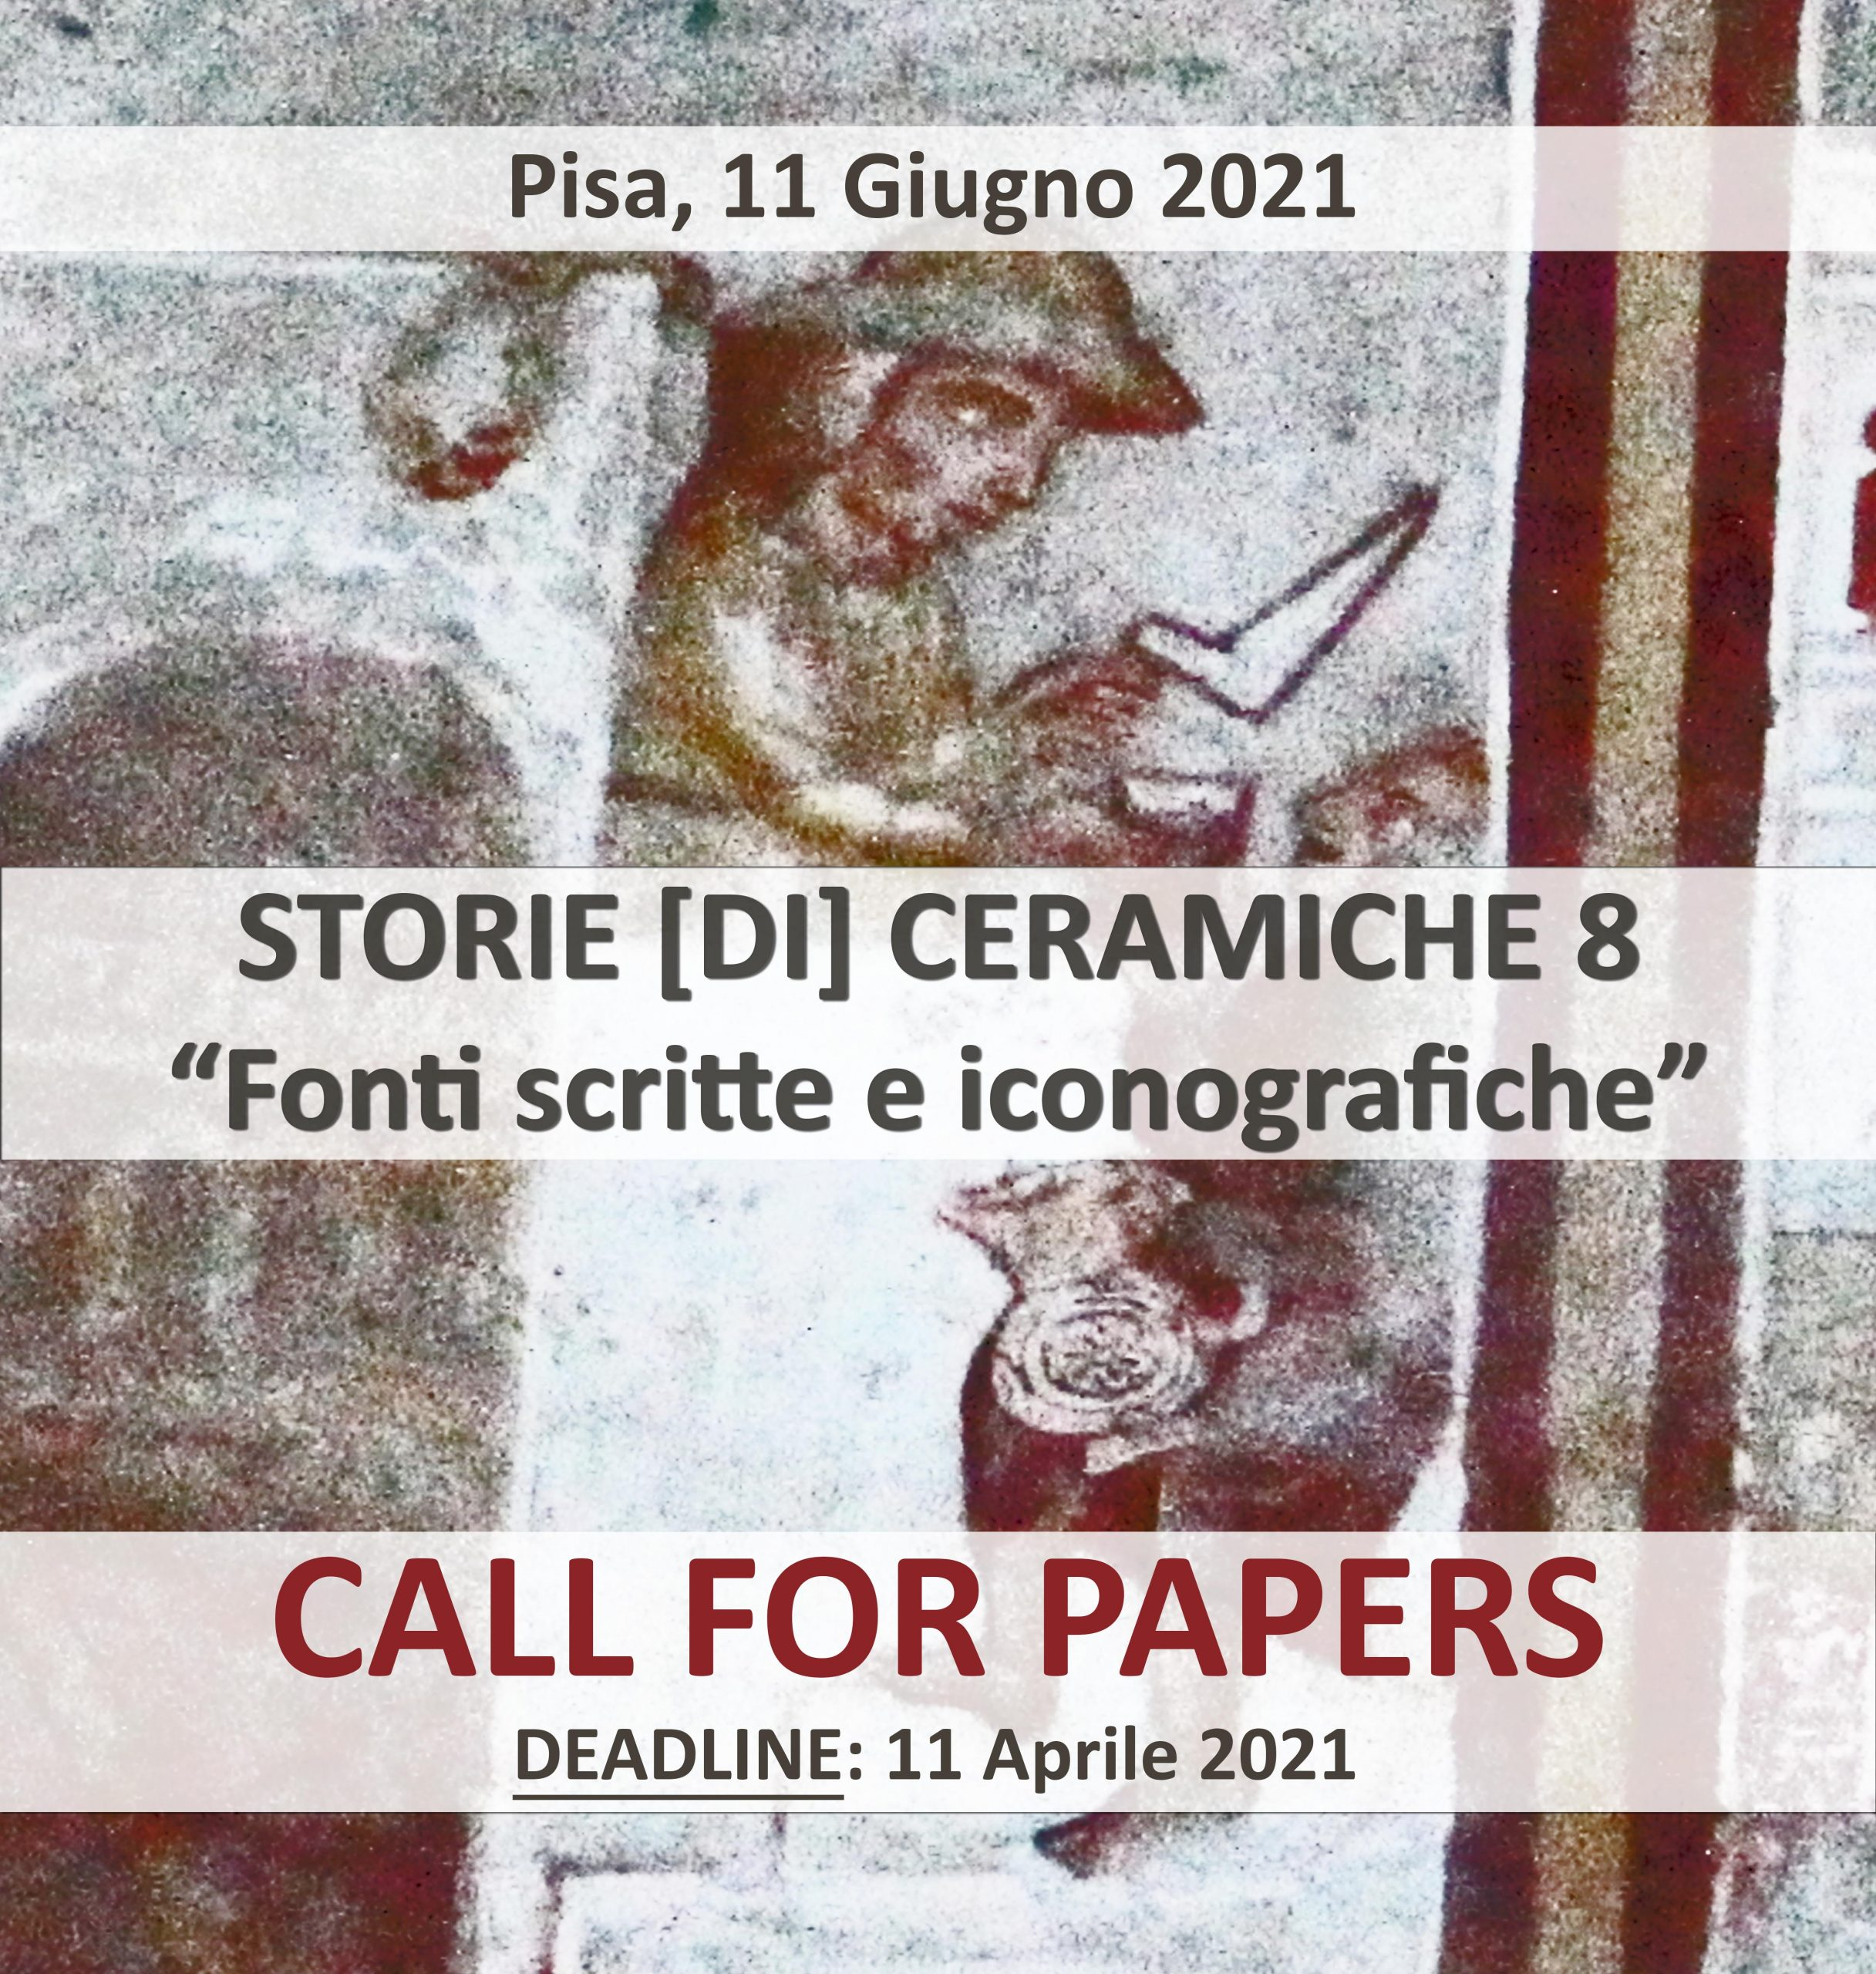 Call for papers, Storie [di] ceramiche 8.